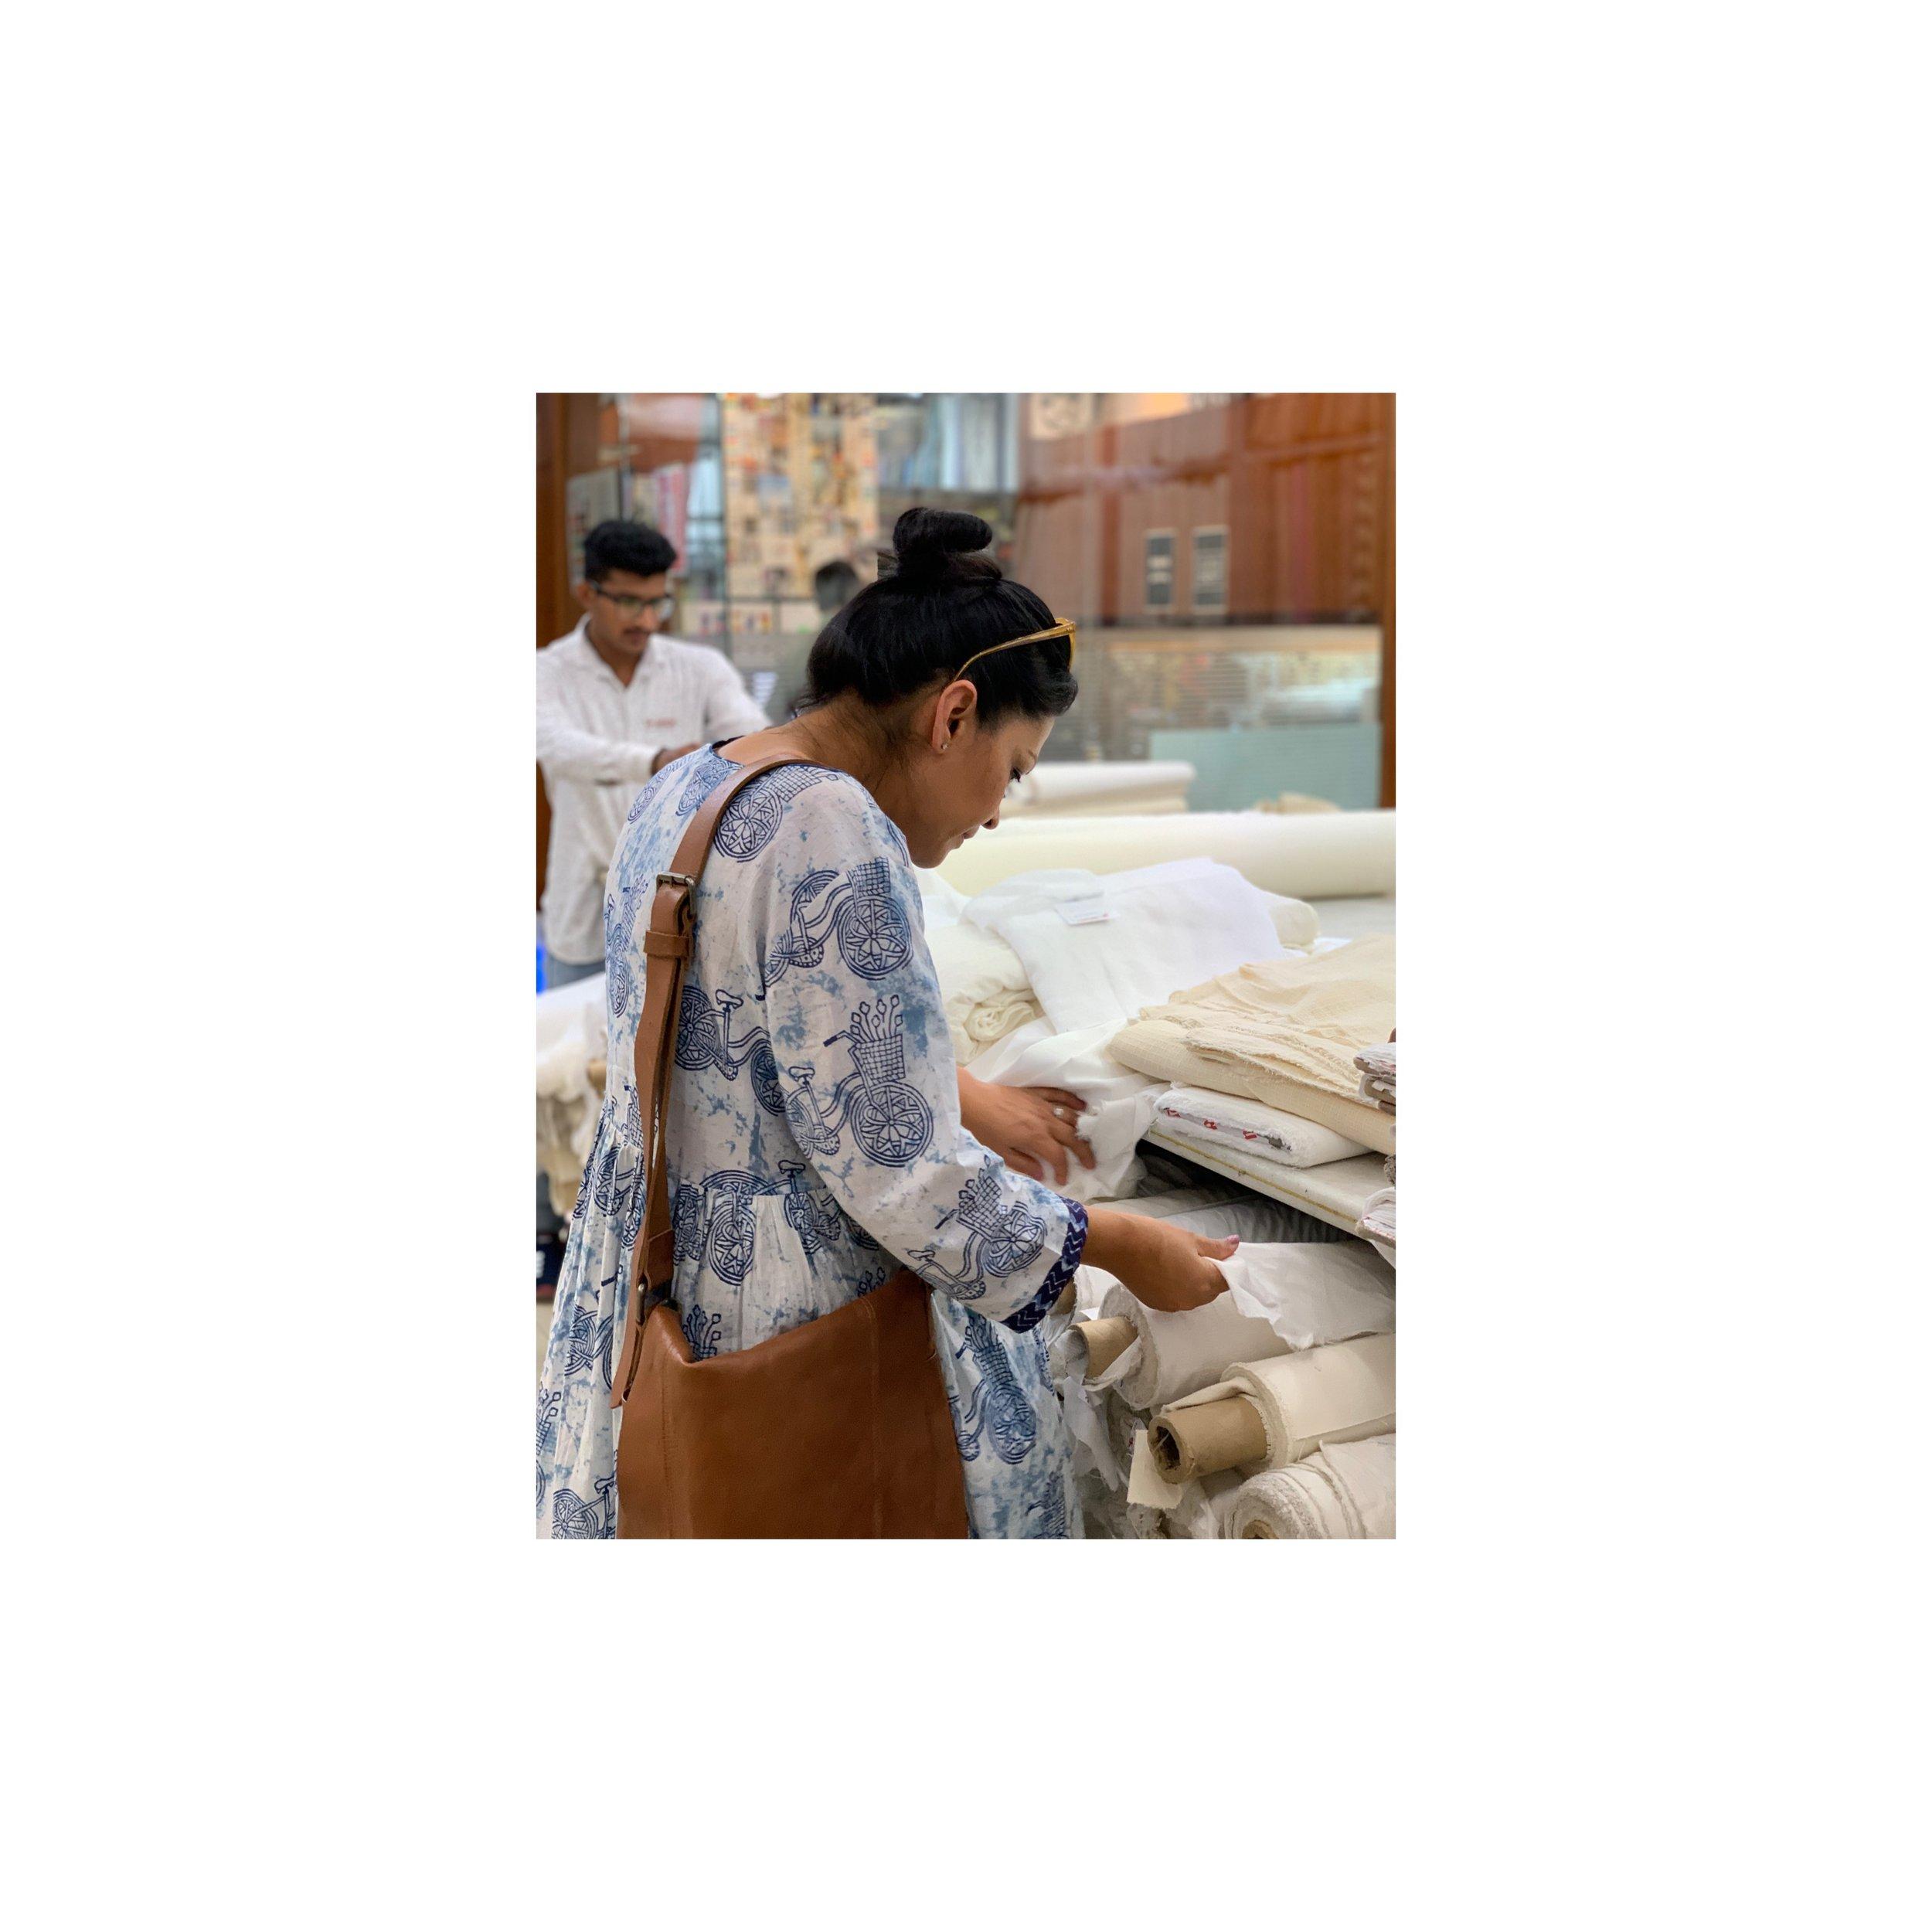 Sourcing Cotton, Linens and Silks in India Fabric Markets - Sahana Byron Bay.JPG